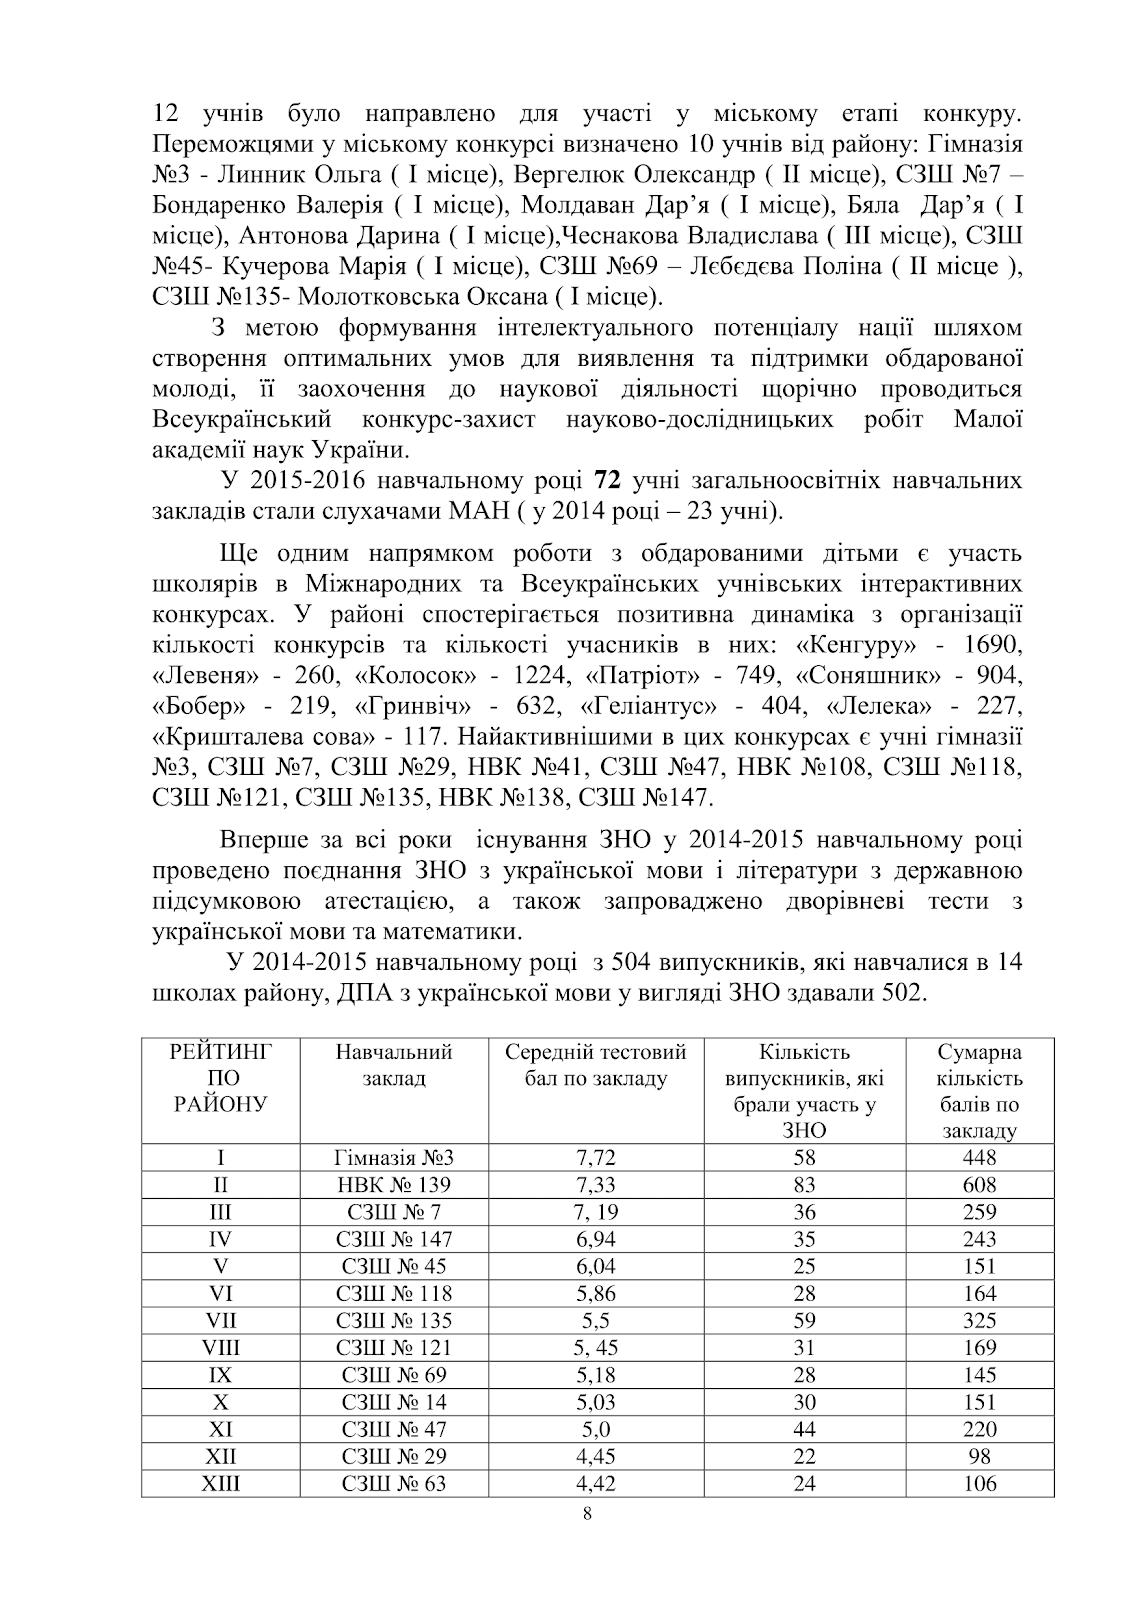 C:\Users\Валерия\Desktop\план 2016 рік\план 2016 рік-008.png